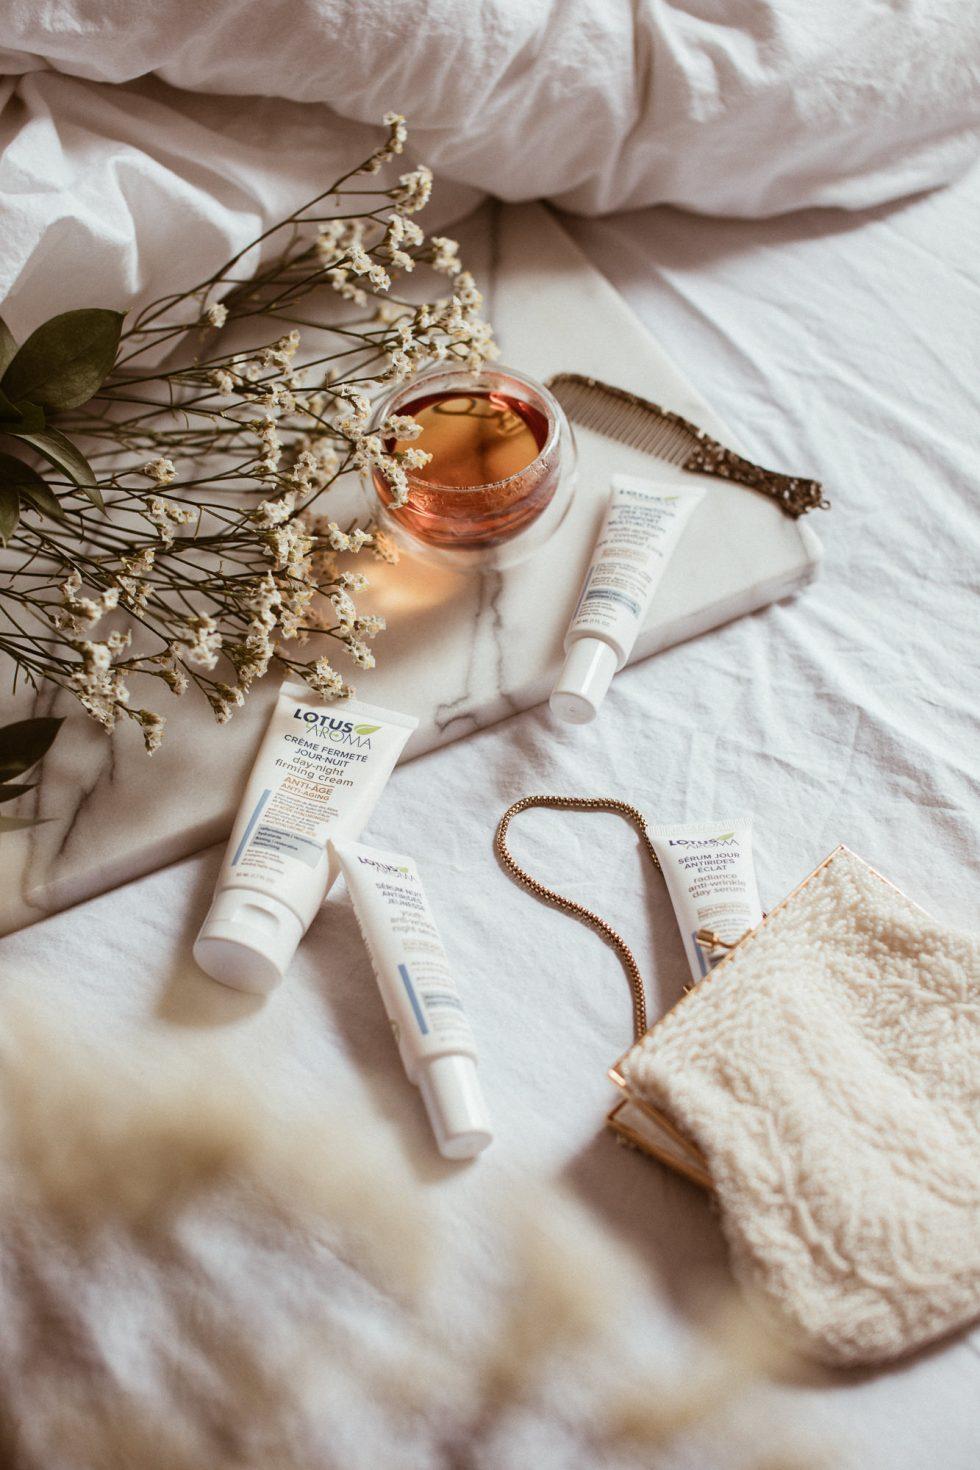 ethical-sustainable-cosmetics-lotus-aroma-montreal-lifestyle-photographer-laura-g-diaz